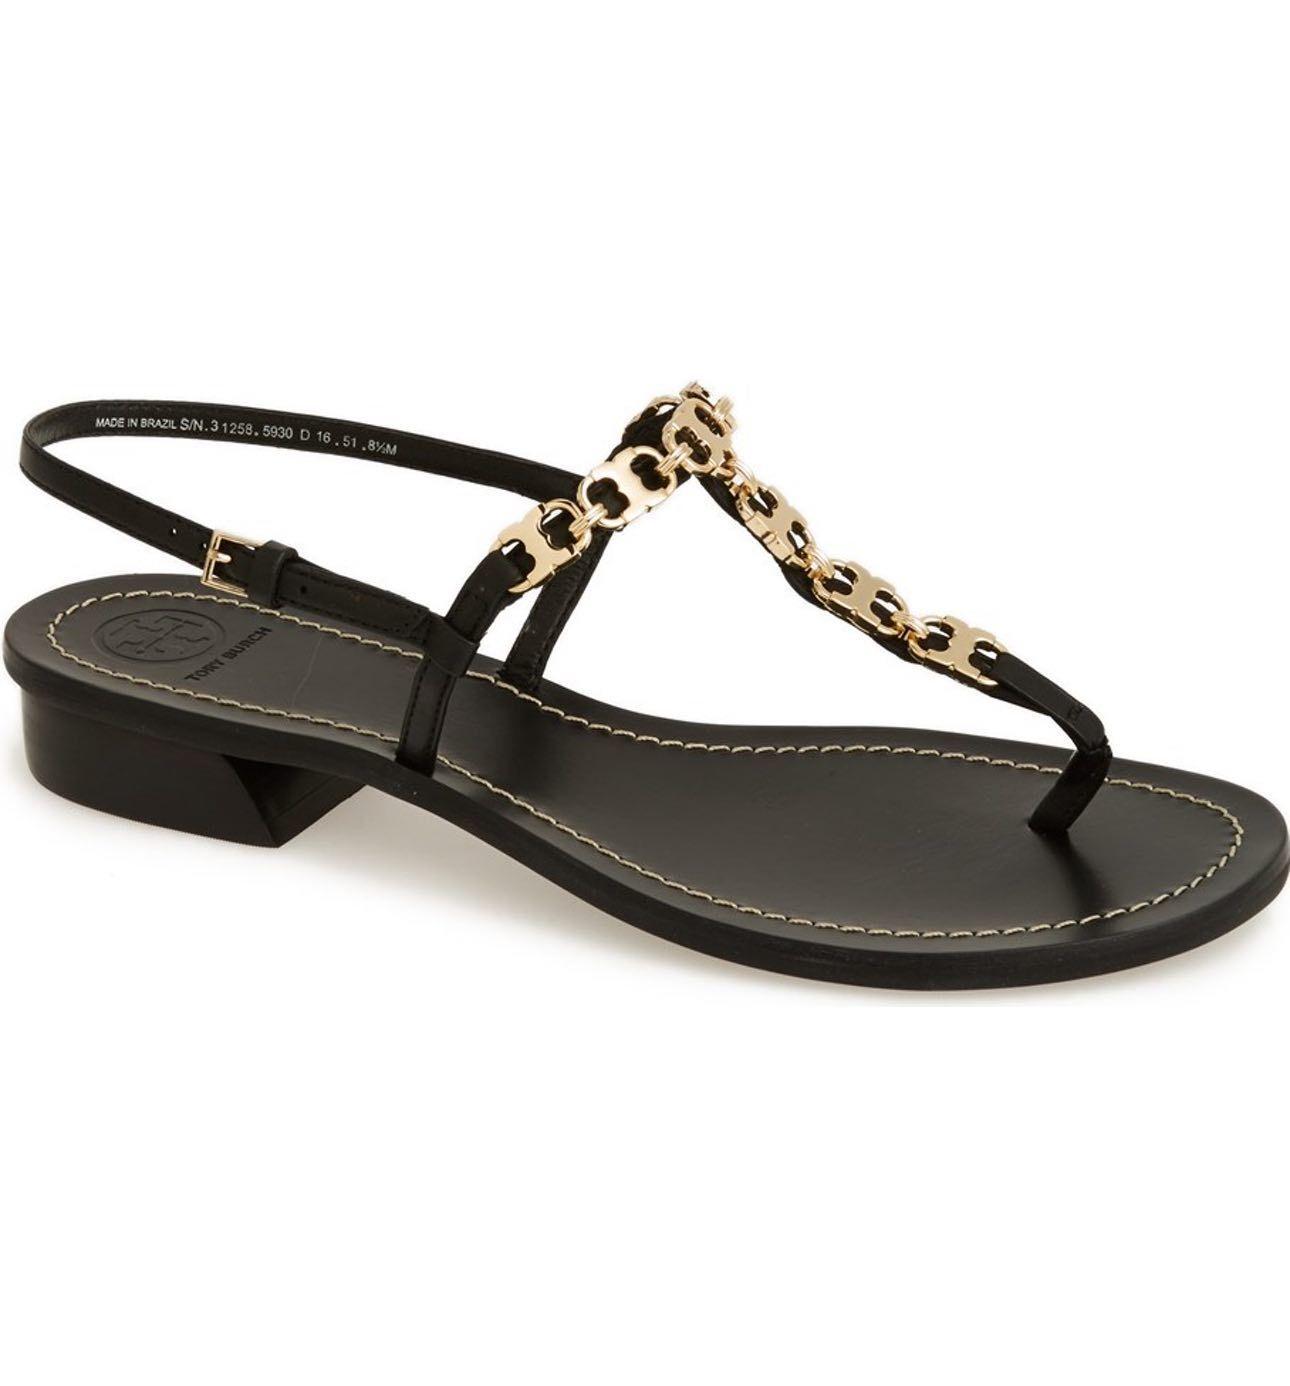 TORY BURCH Gemini Link T-Strap Sandal BLACK 9 NIB Sandals ( 225) Vacation GIFT